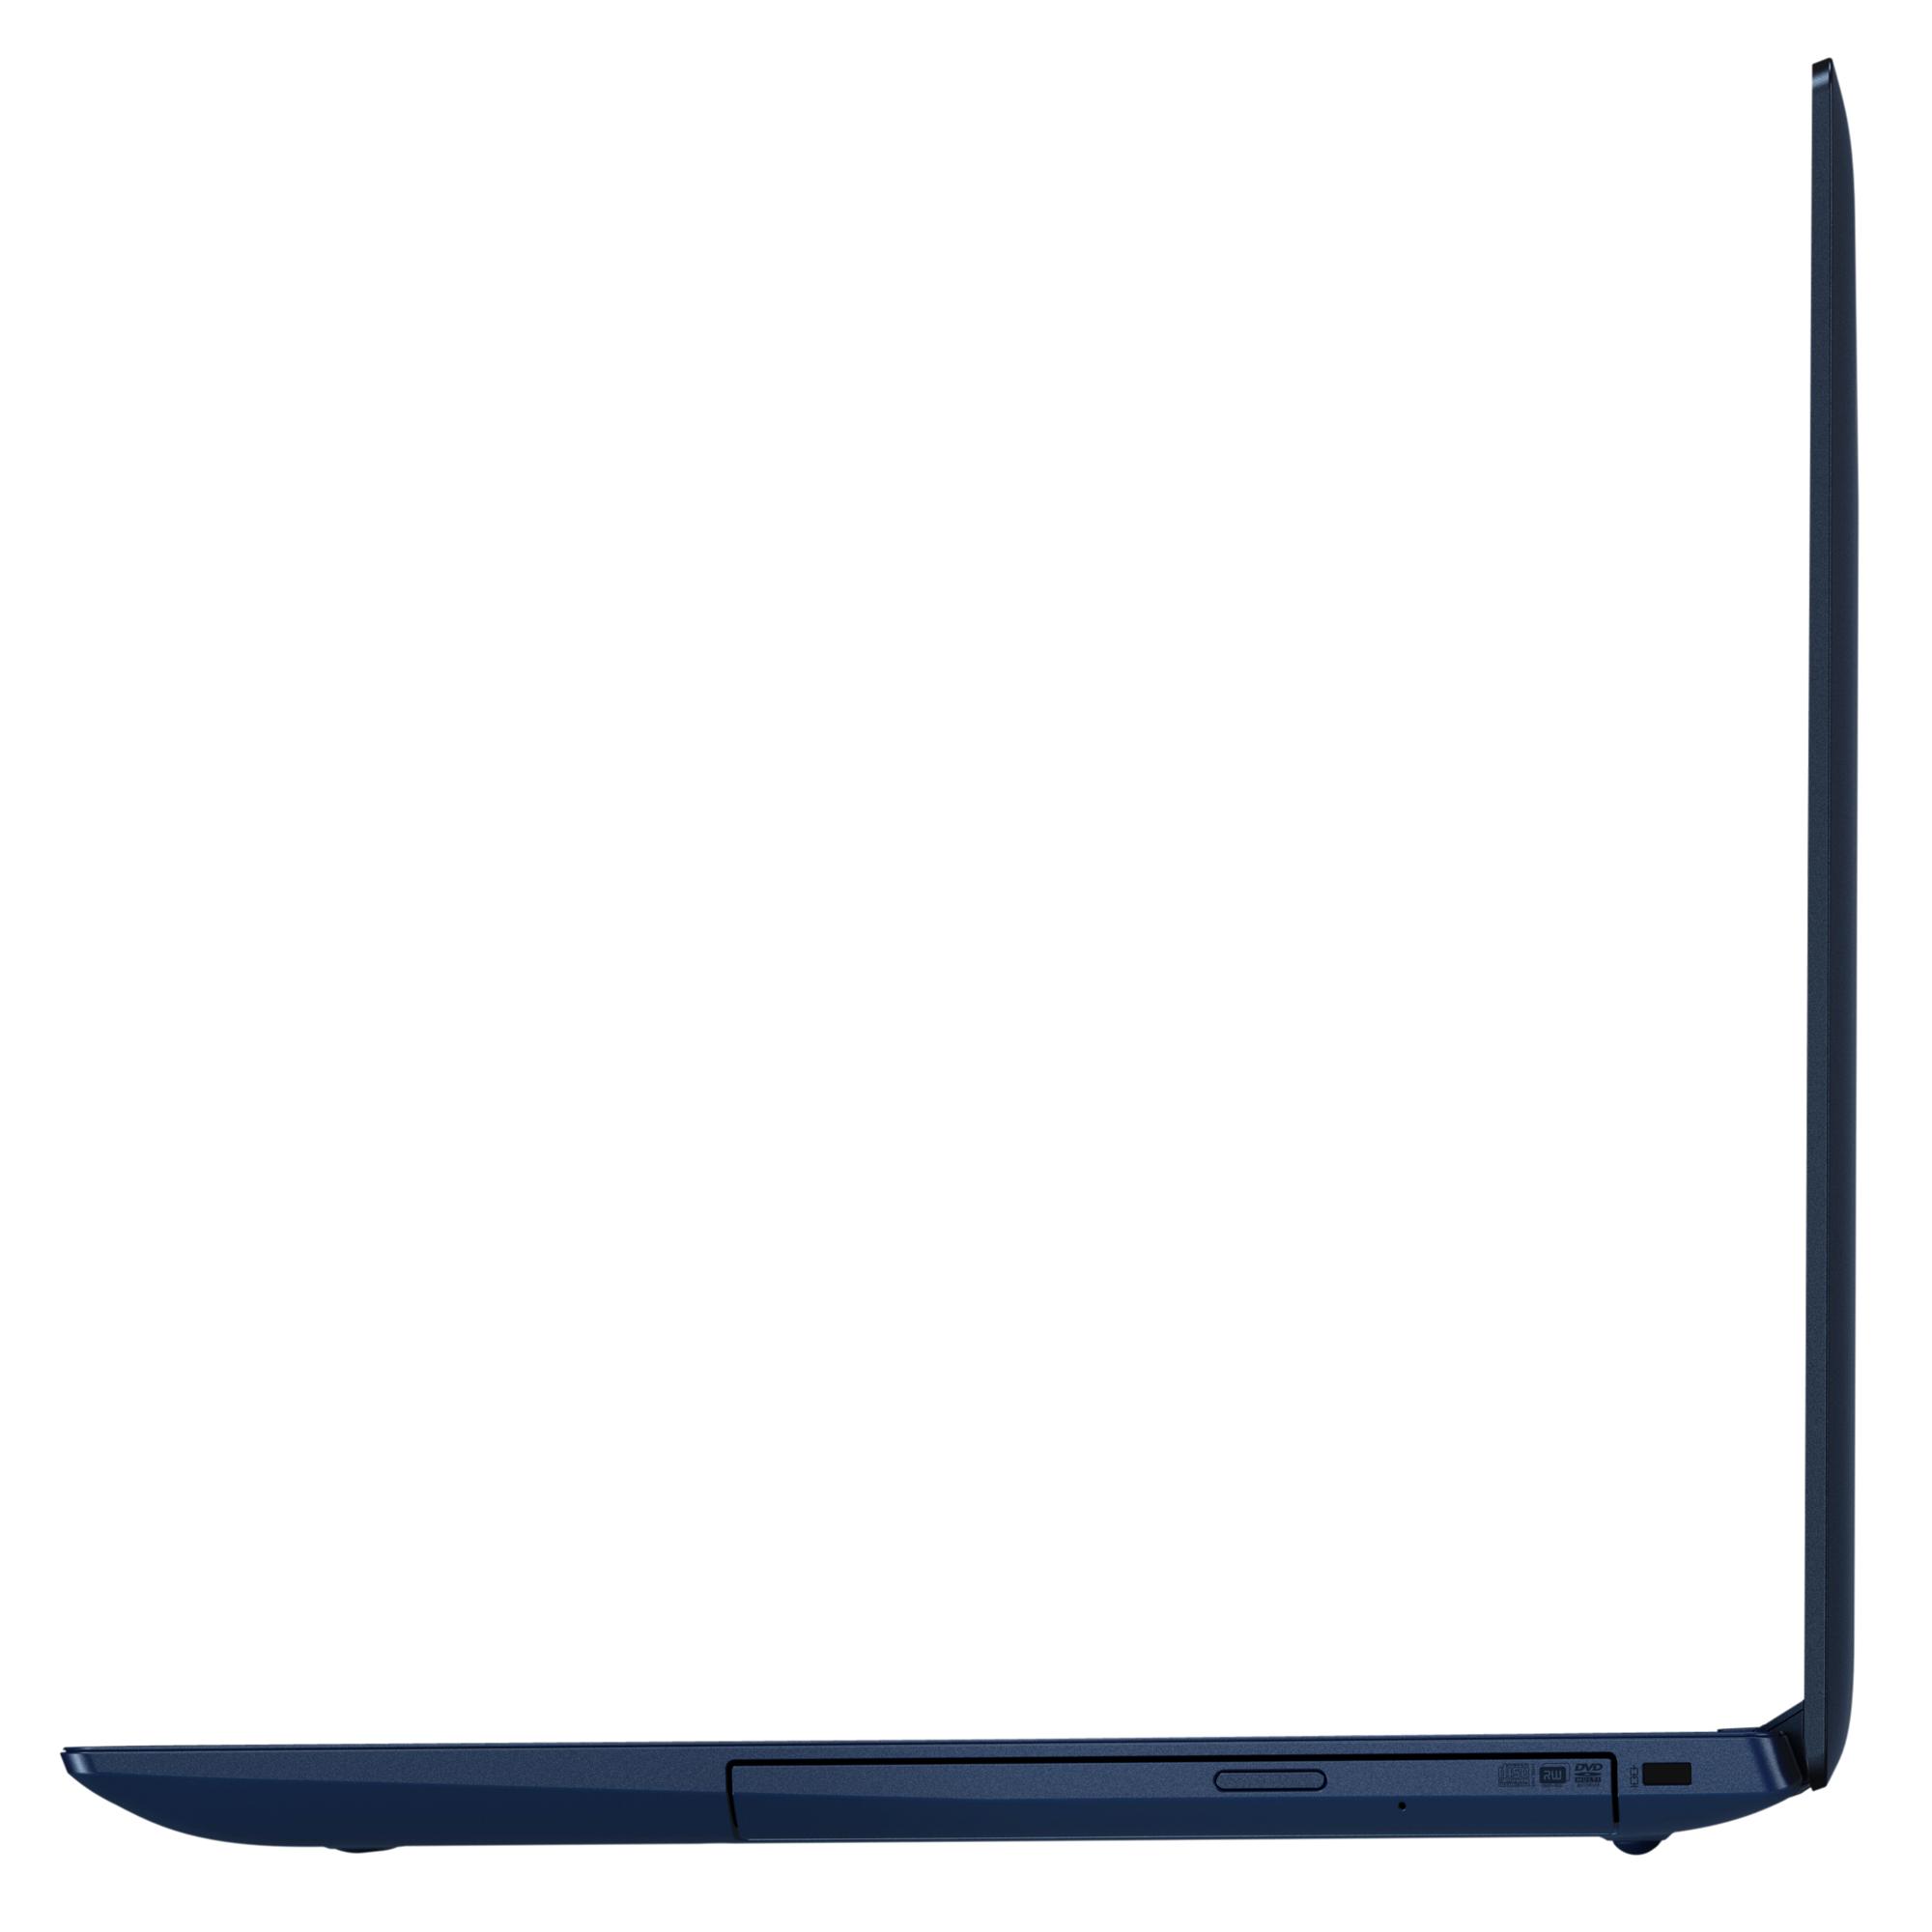 Фото  Ноутбук Lenovo ideapad 330-15 Midnight Blue (81DC00RNRA)